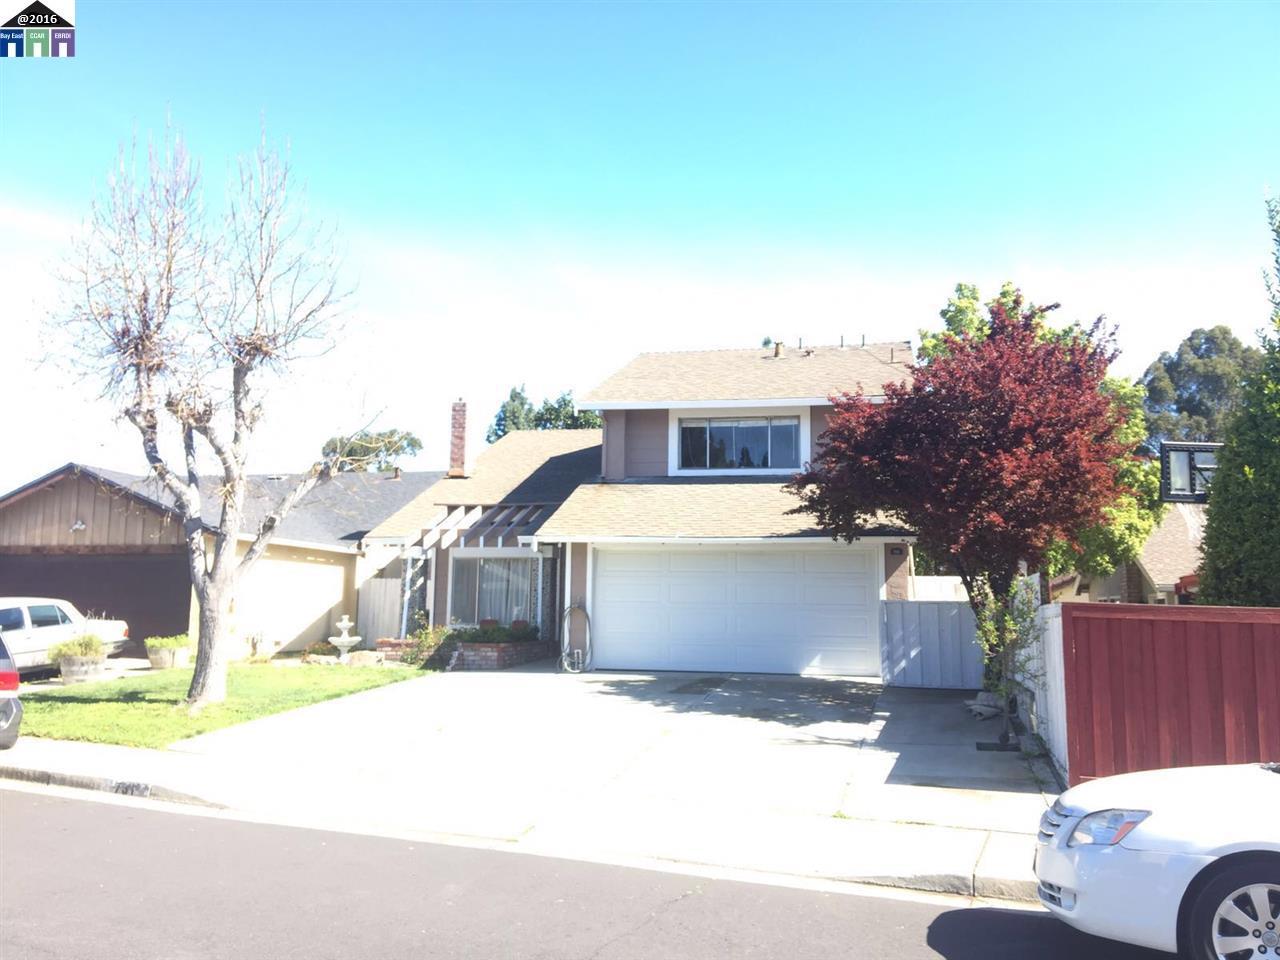 731 Seacliff Ct, Rodeo, CA